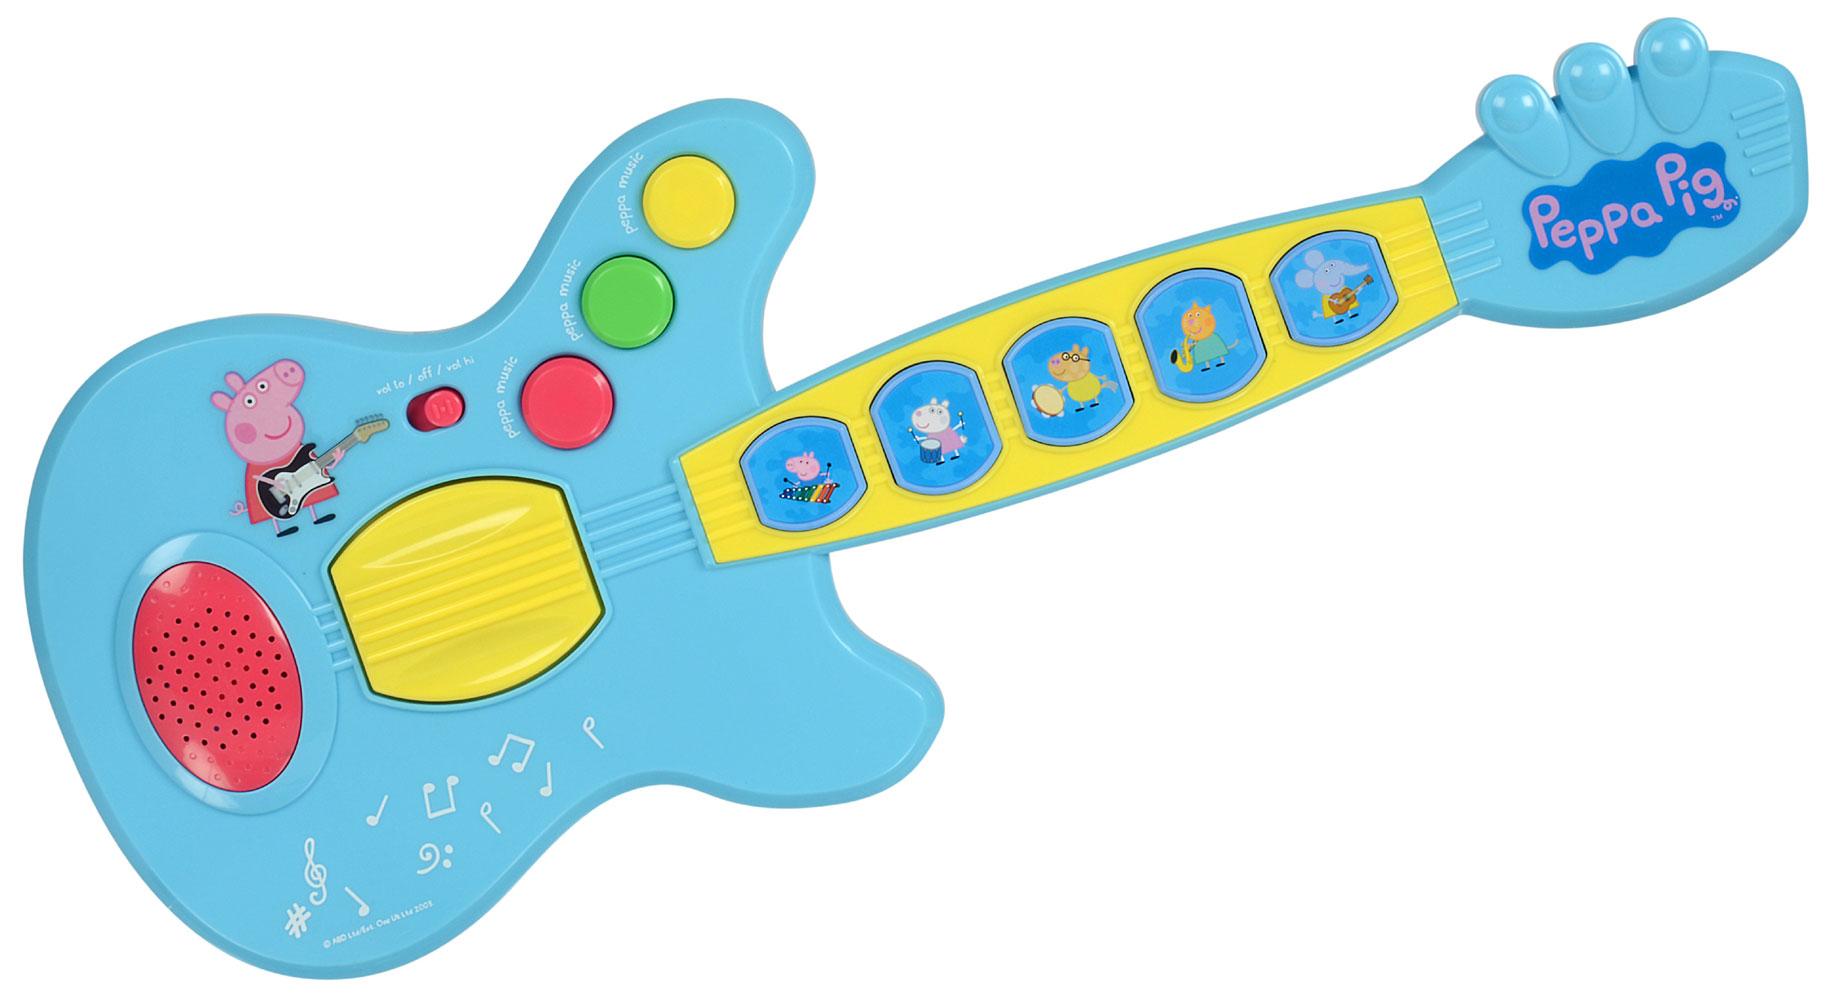 Kids Peppa Pig Guitar Children/'s Musical Toy Green Small